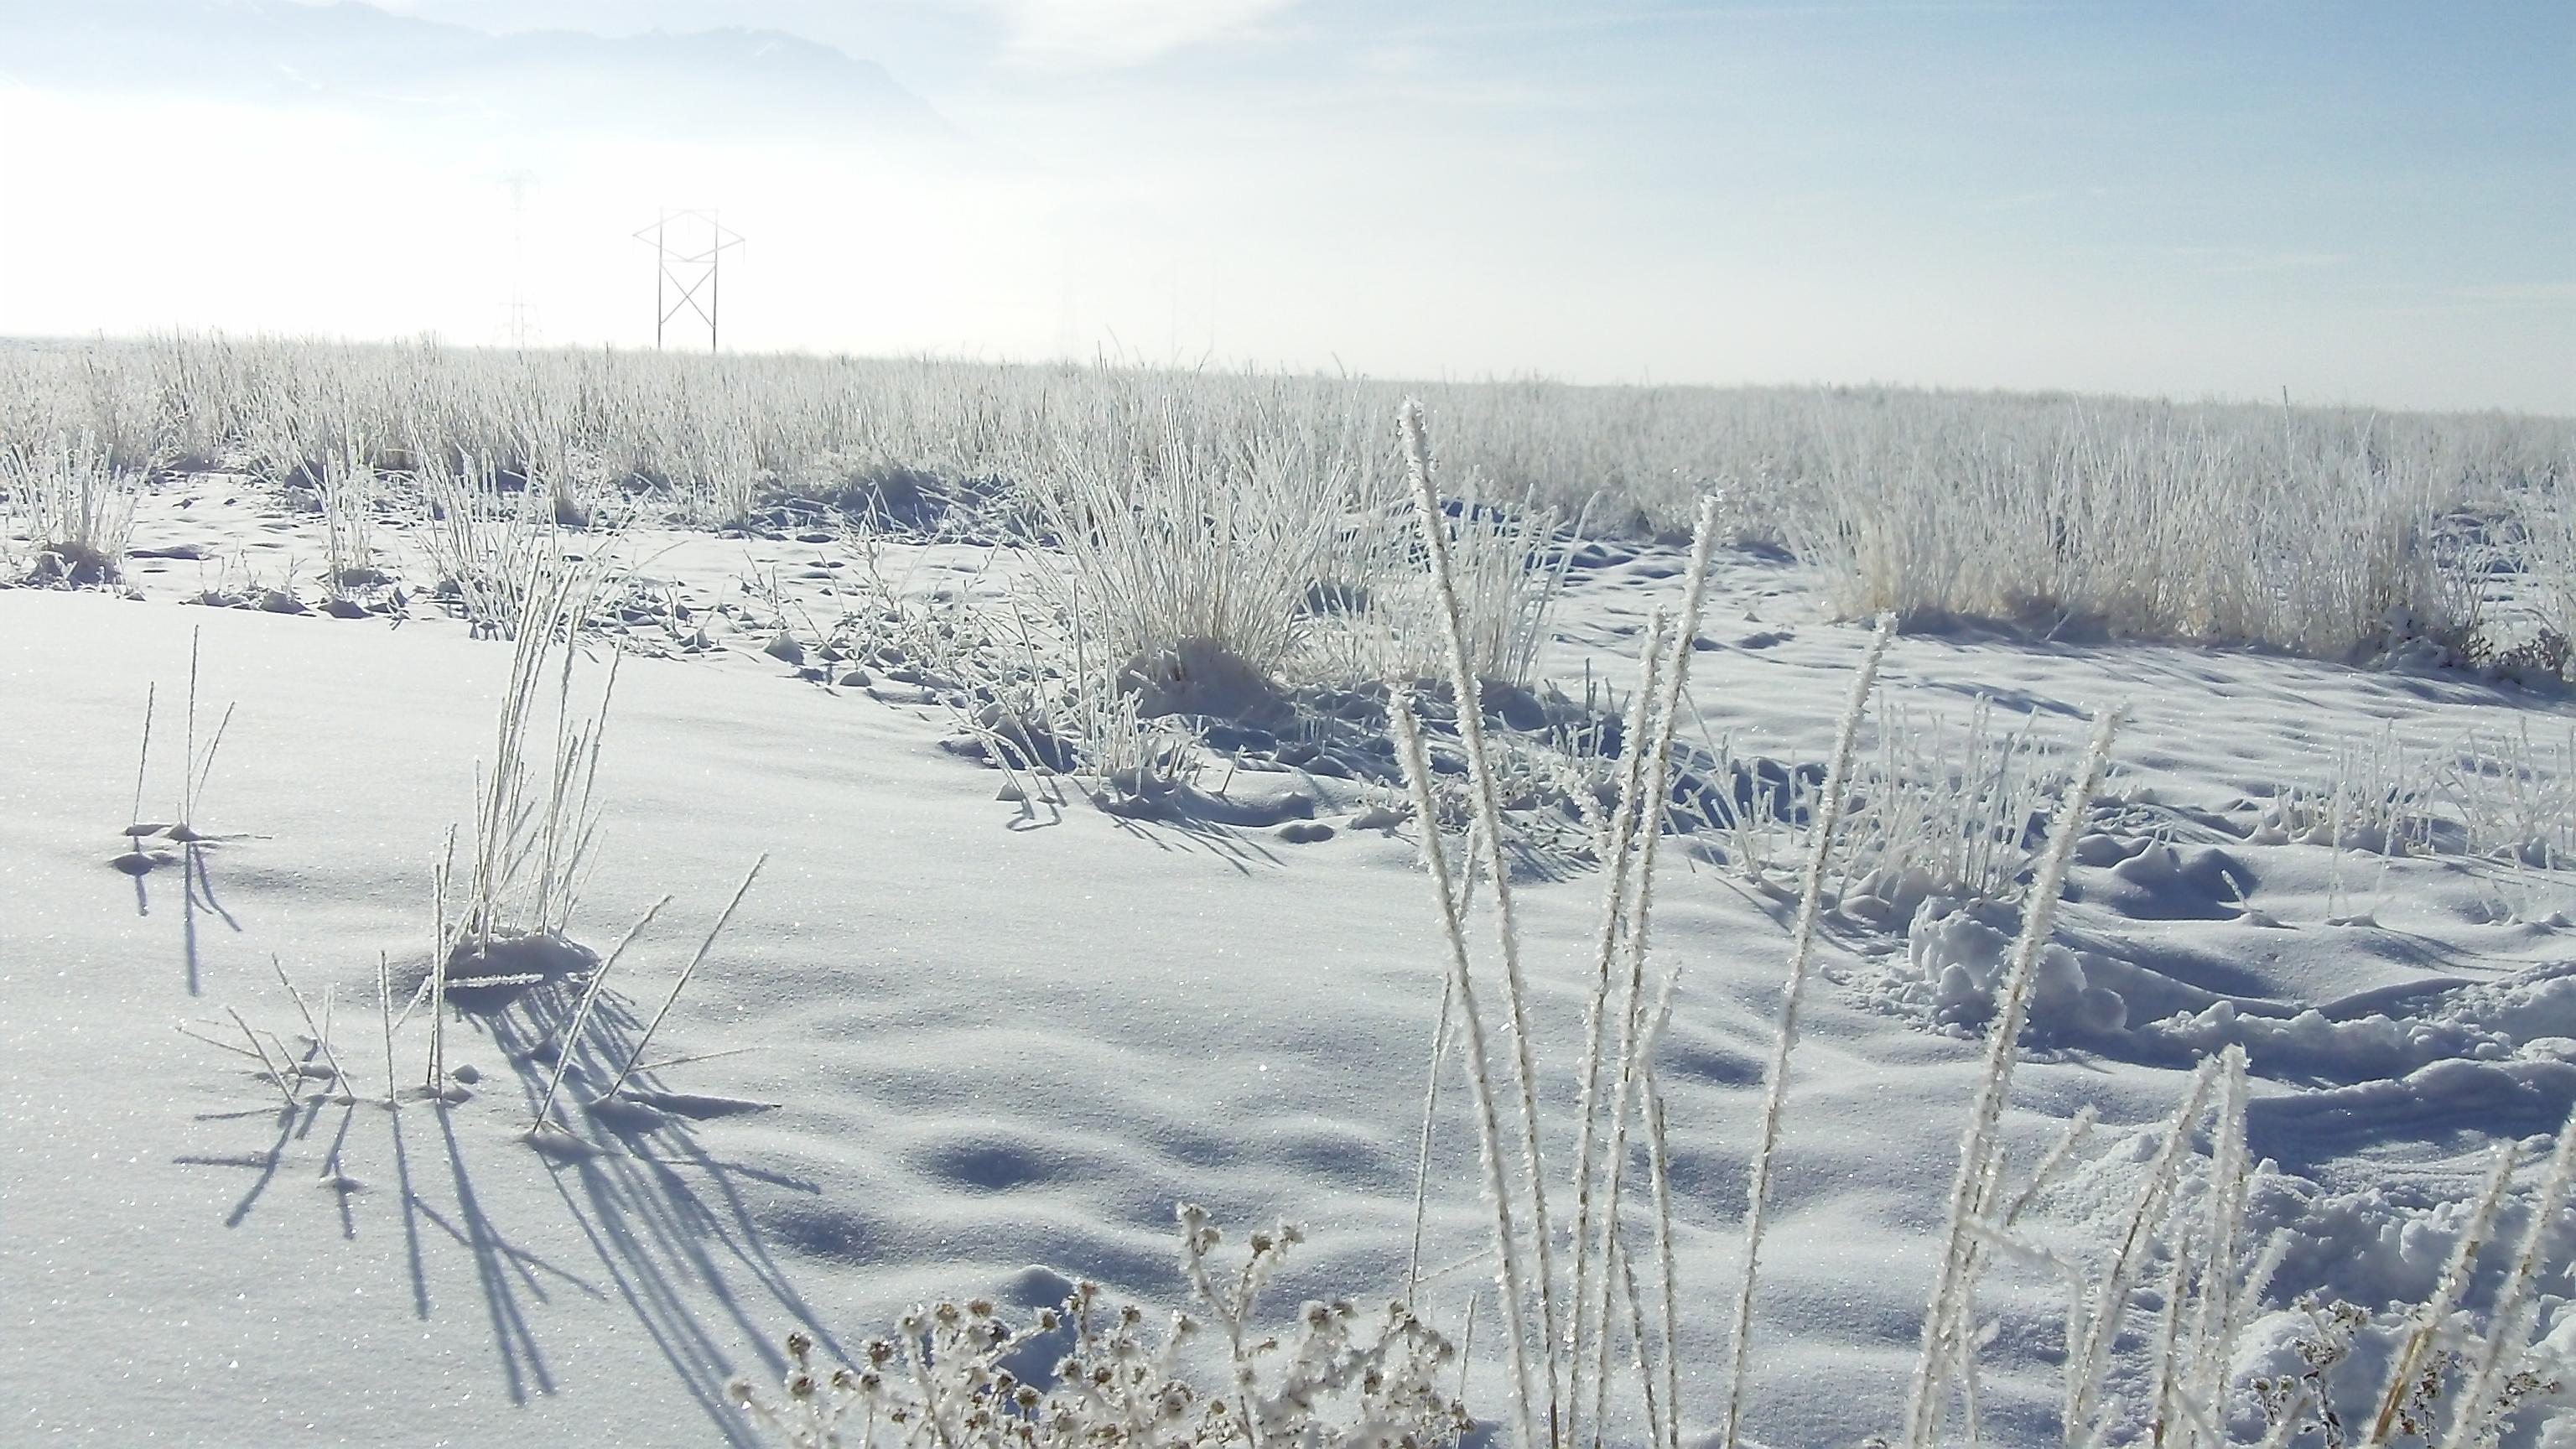 File:Winter Wonderland (5220843441).jpg - Wikimedia Commons